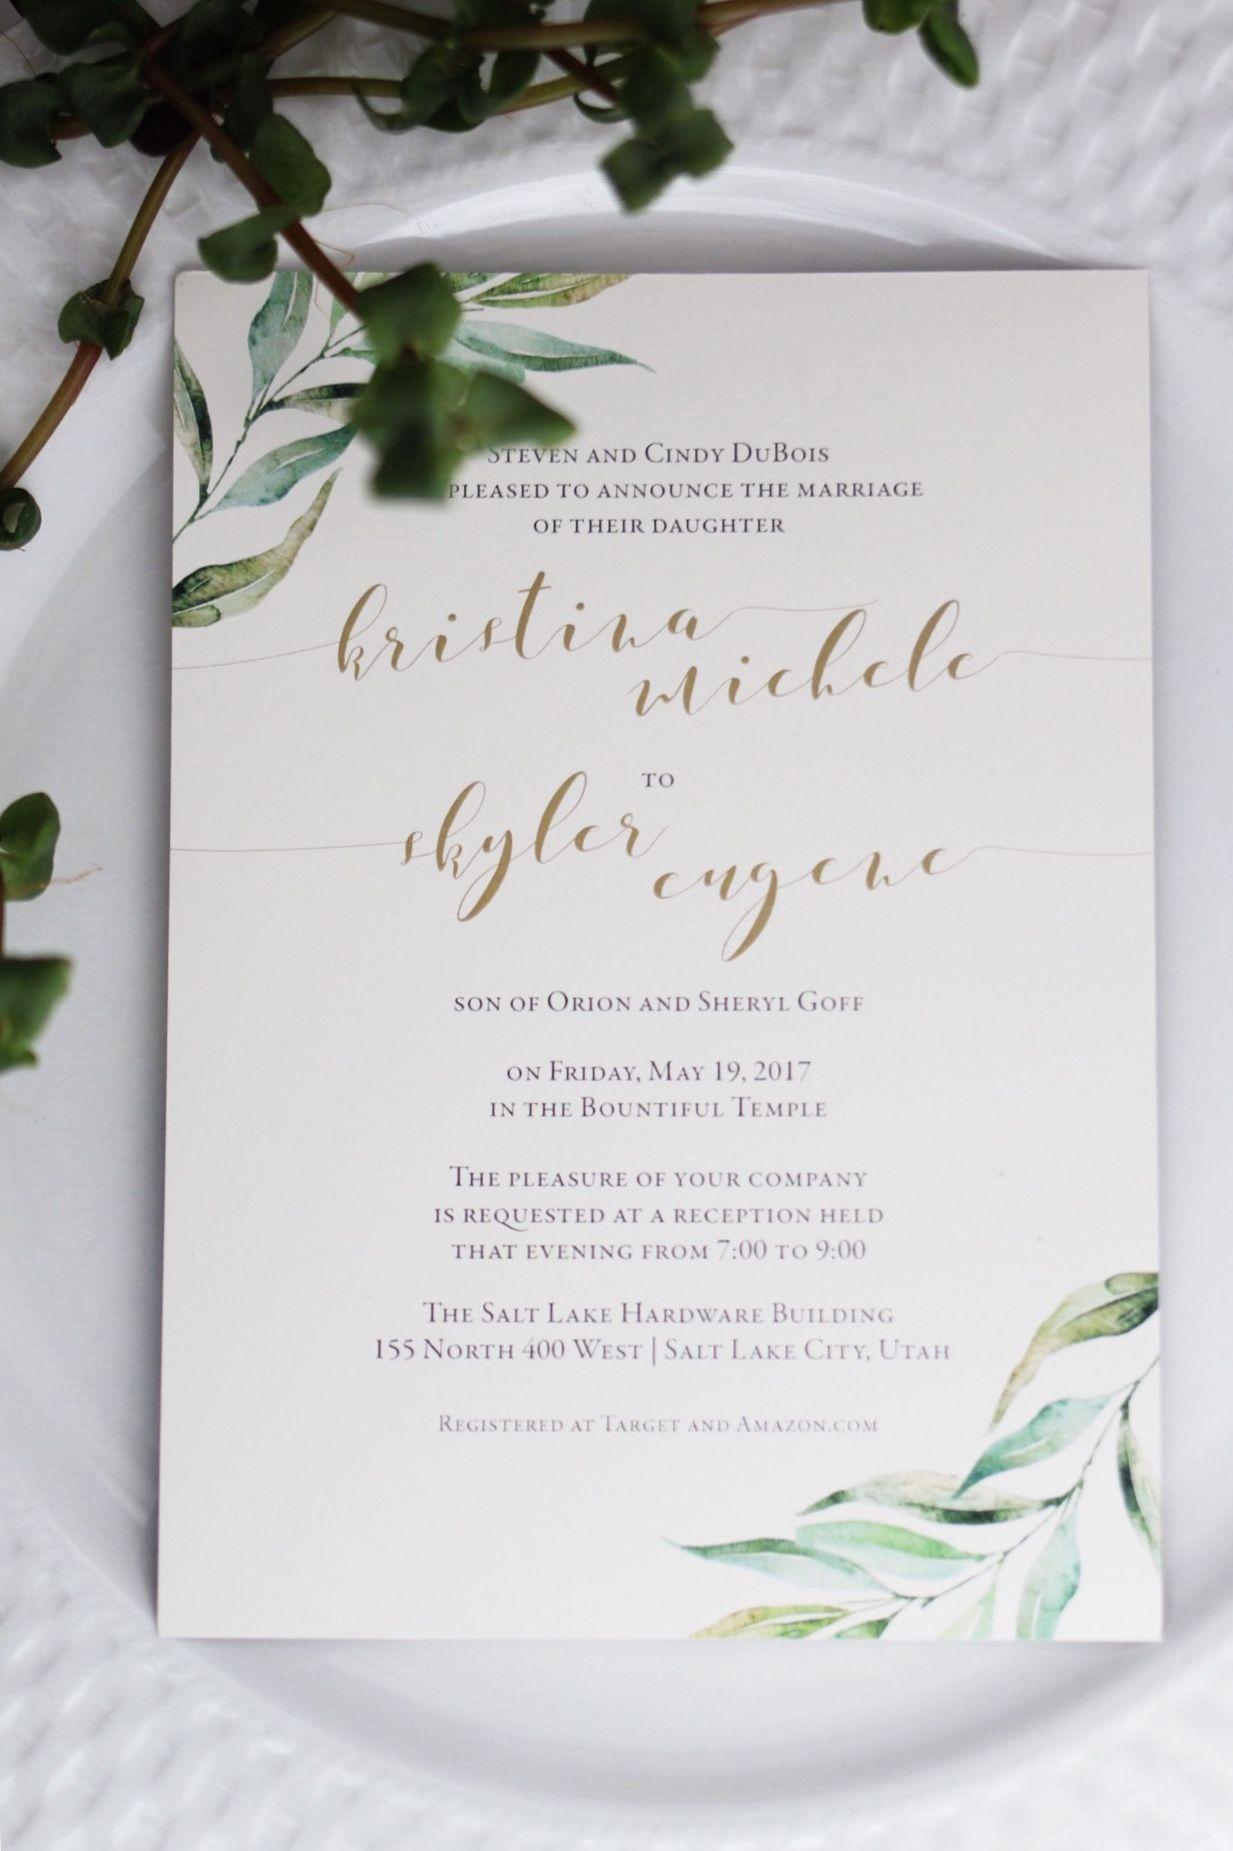 Watercolor leafy greenery wedding invitations!